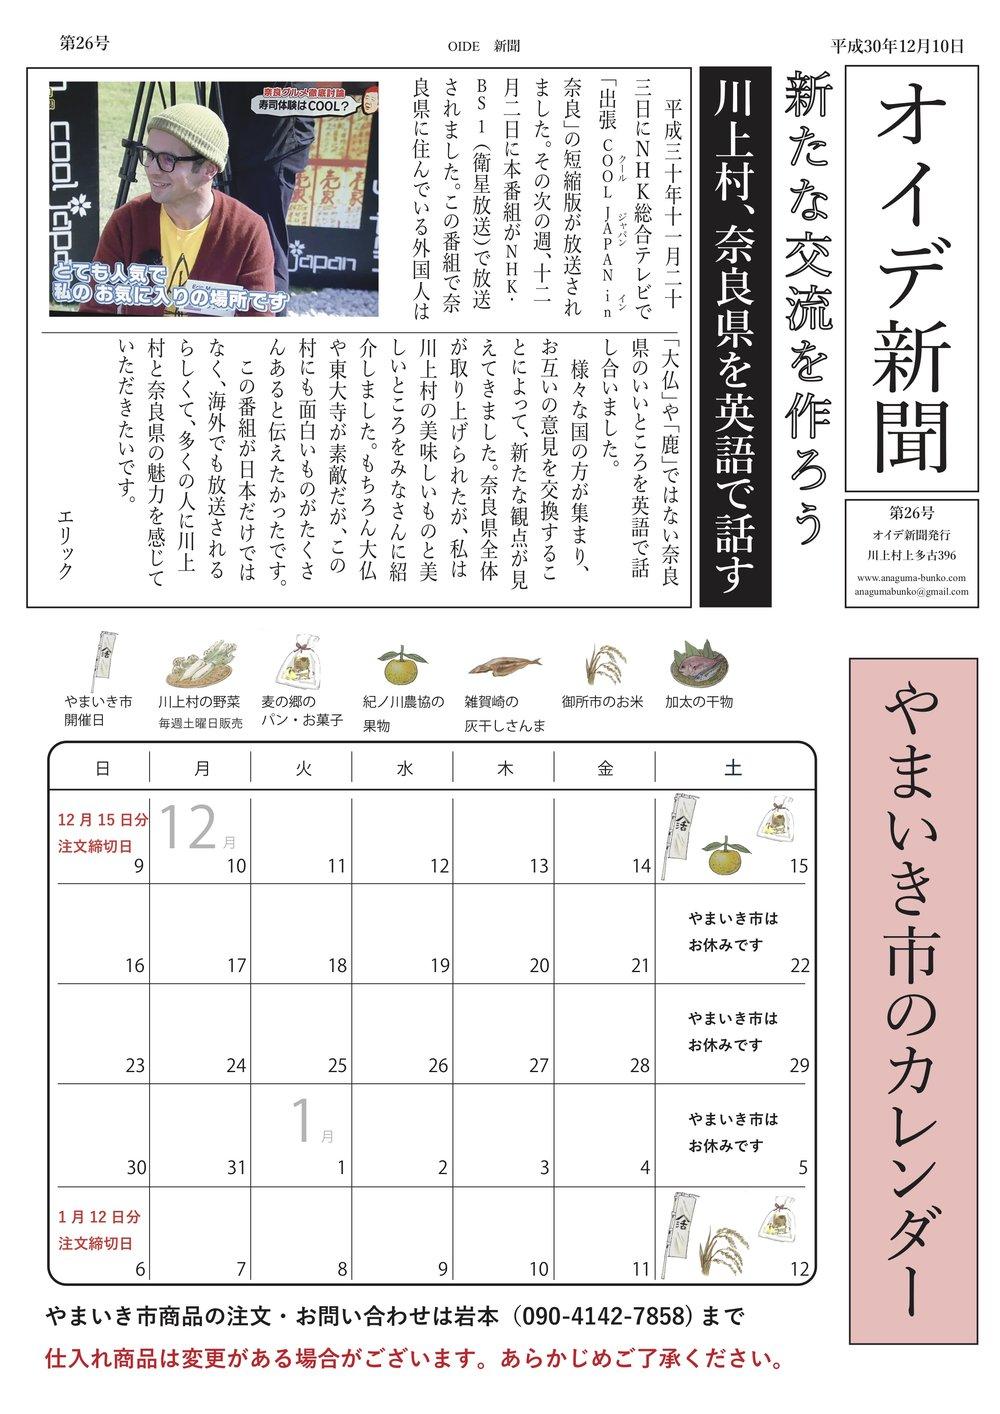 oide新聞30年12月号表.jpg